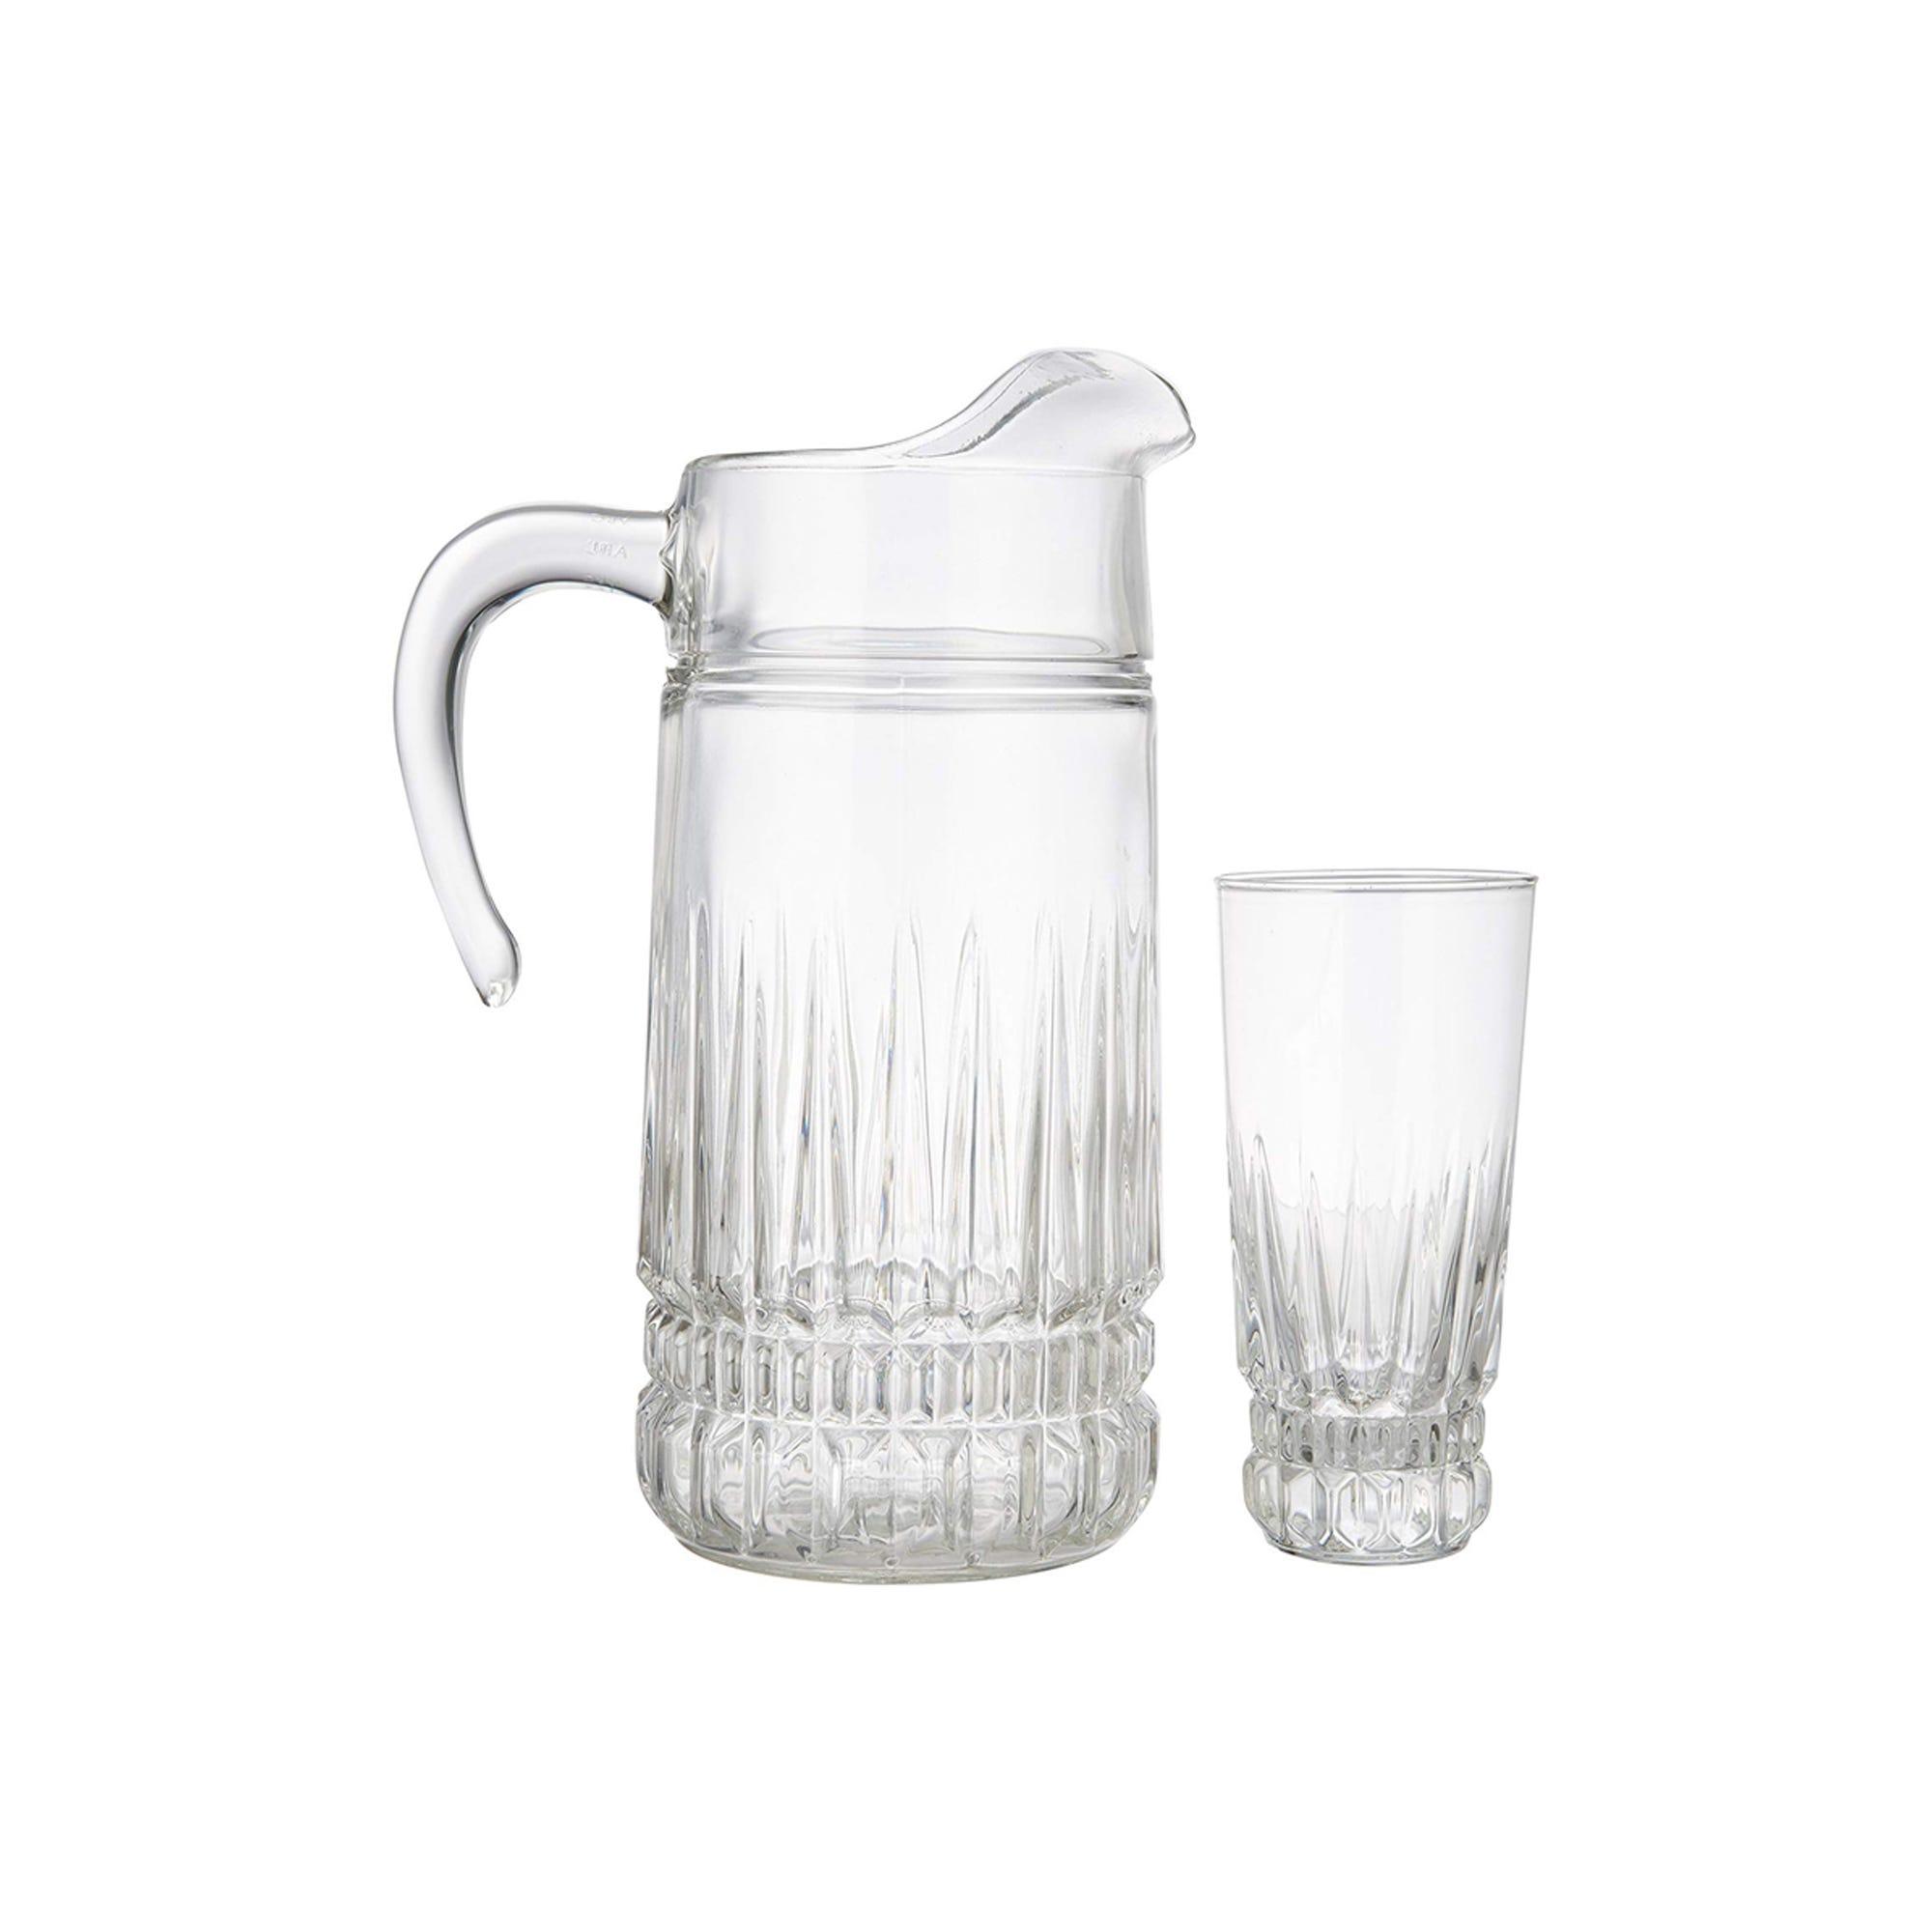 Jarra de vidrio con 6 Vasos de vidrio Imperator